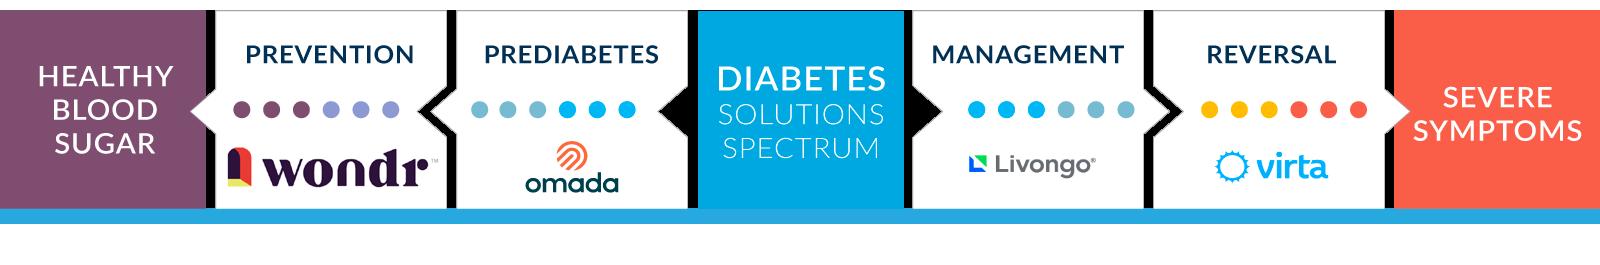 diabetes solutions spectrum